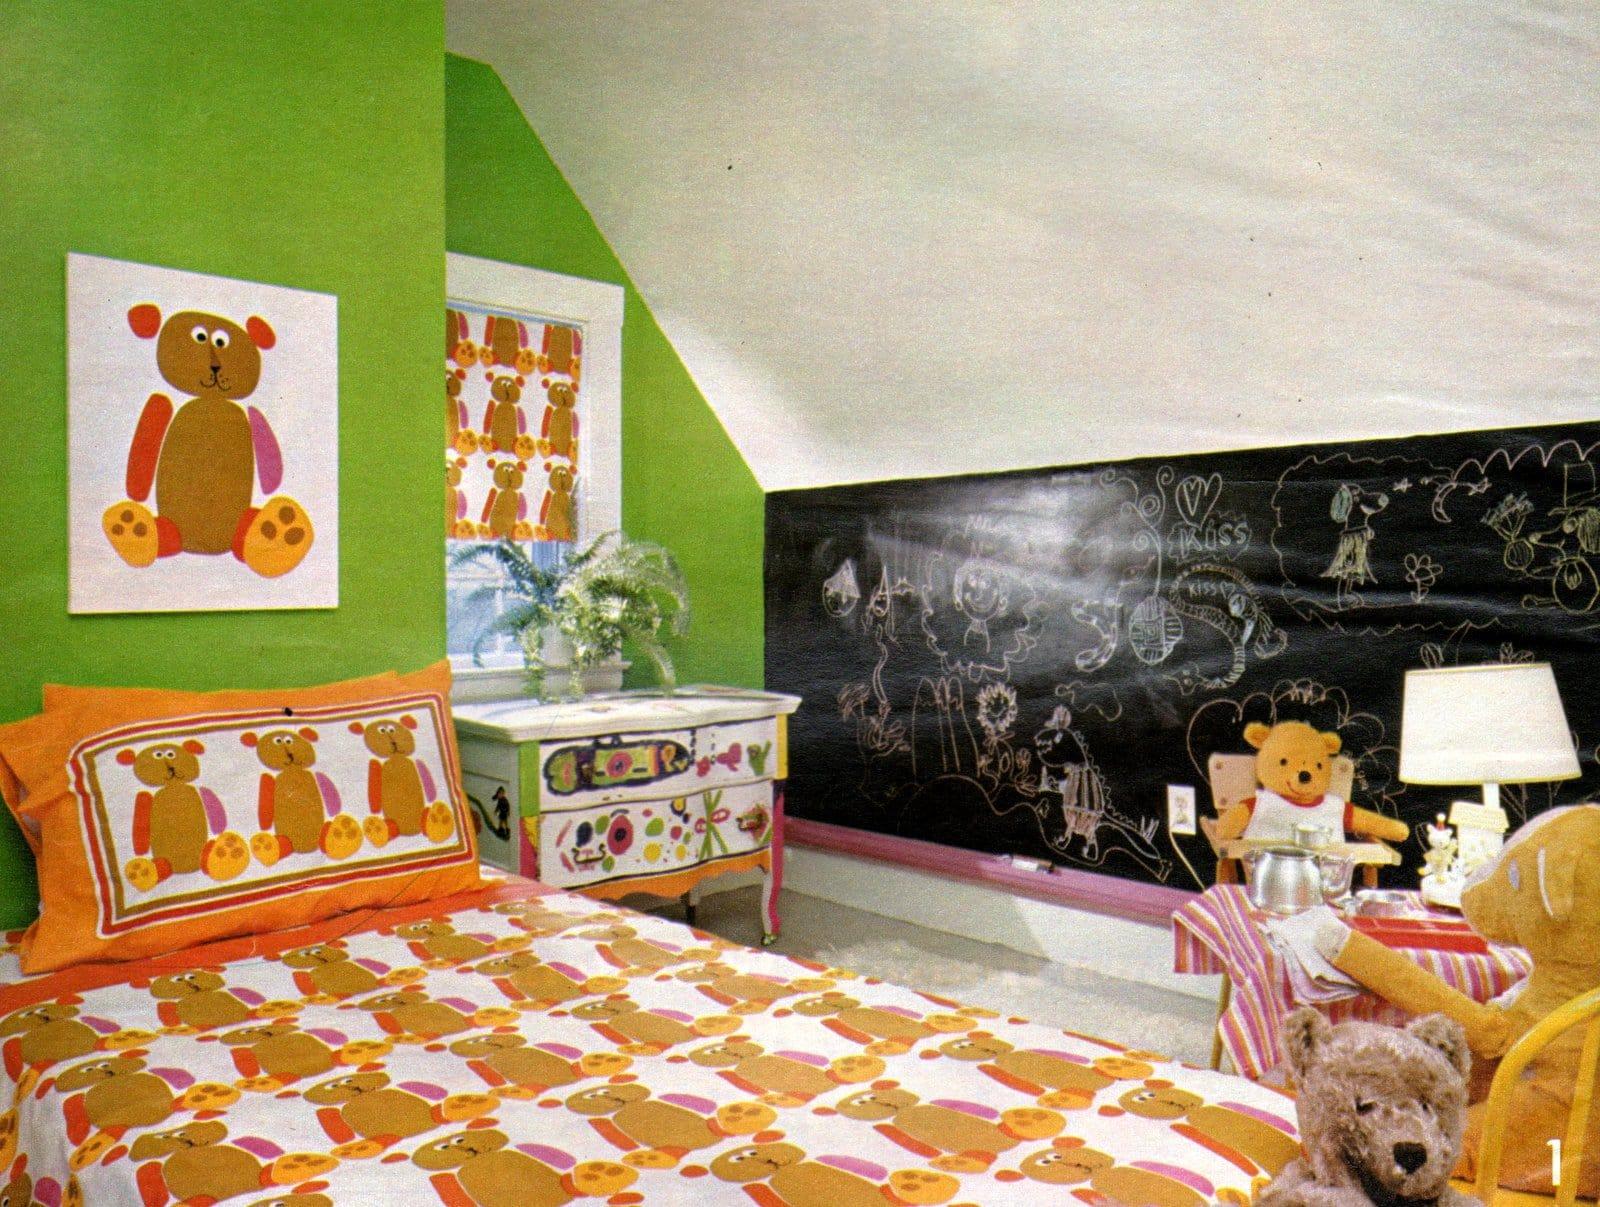 1970s kids bedroom decor with teddy bear pattern (1972)